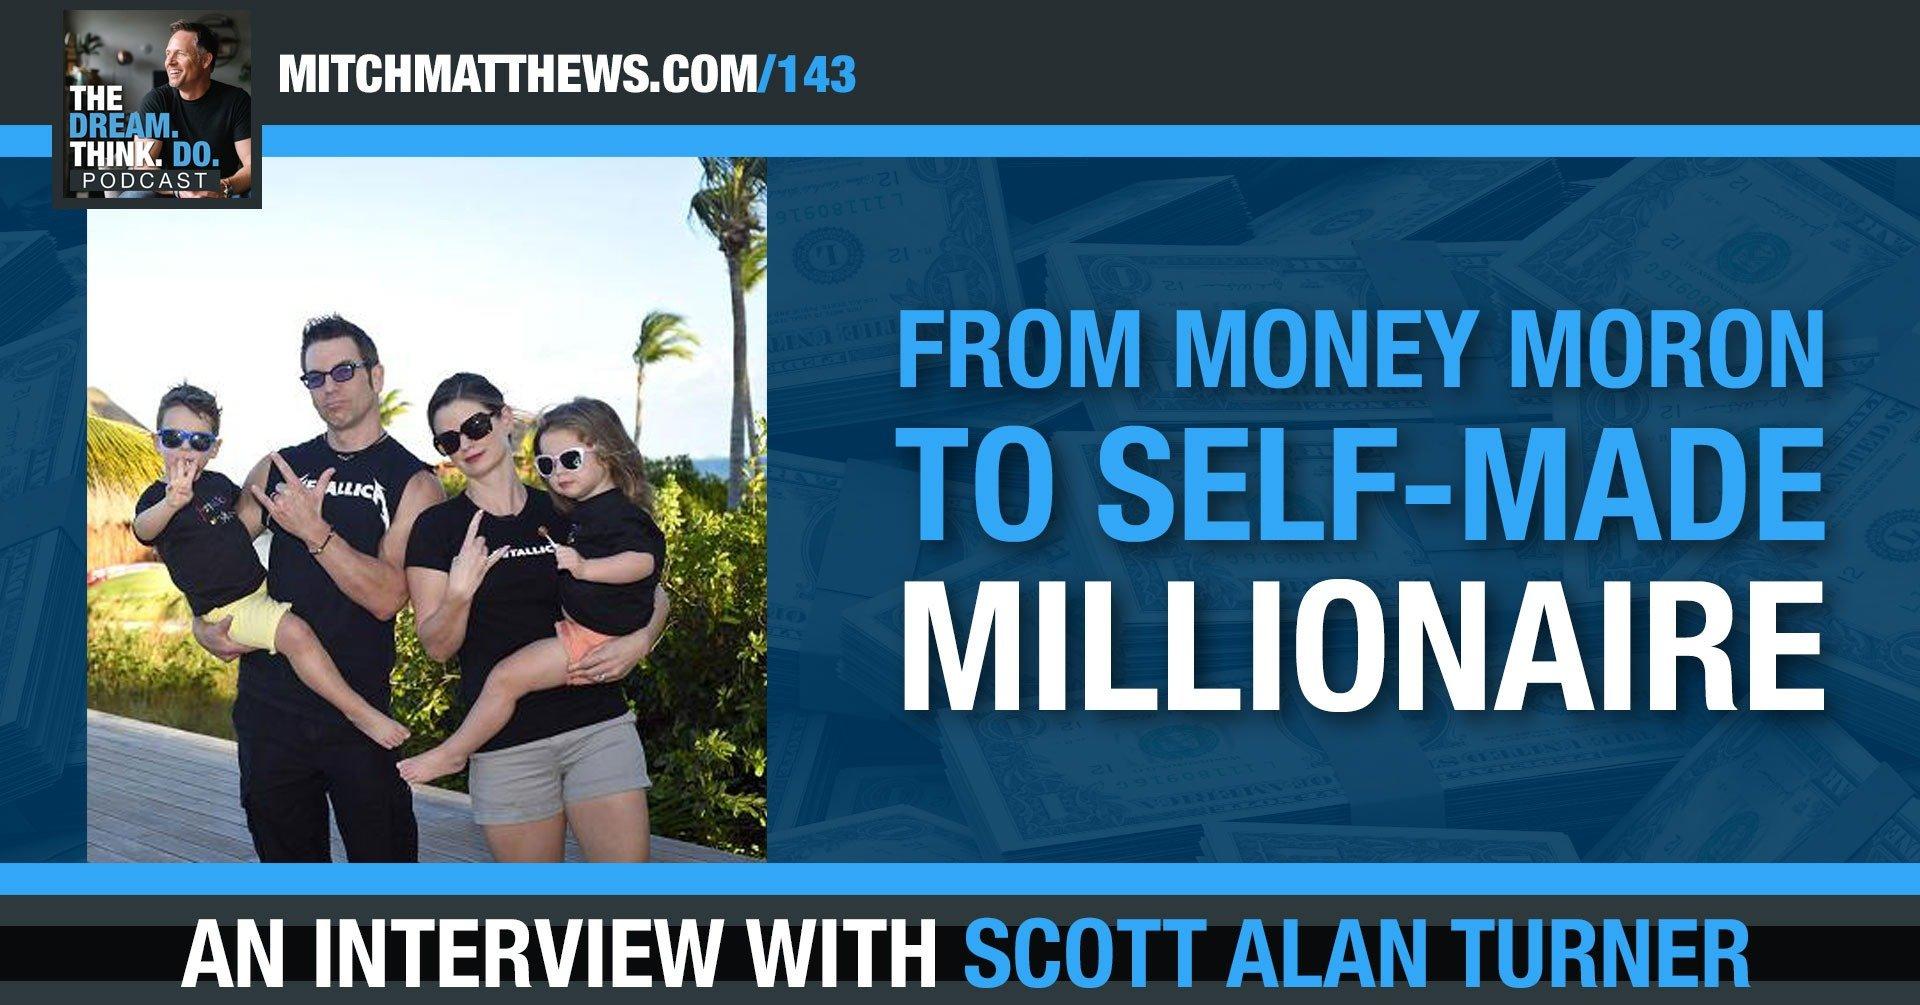 An interview with Scott Alan Turner